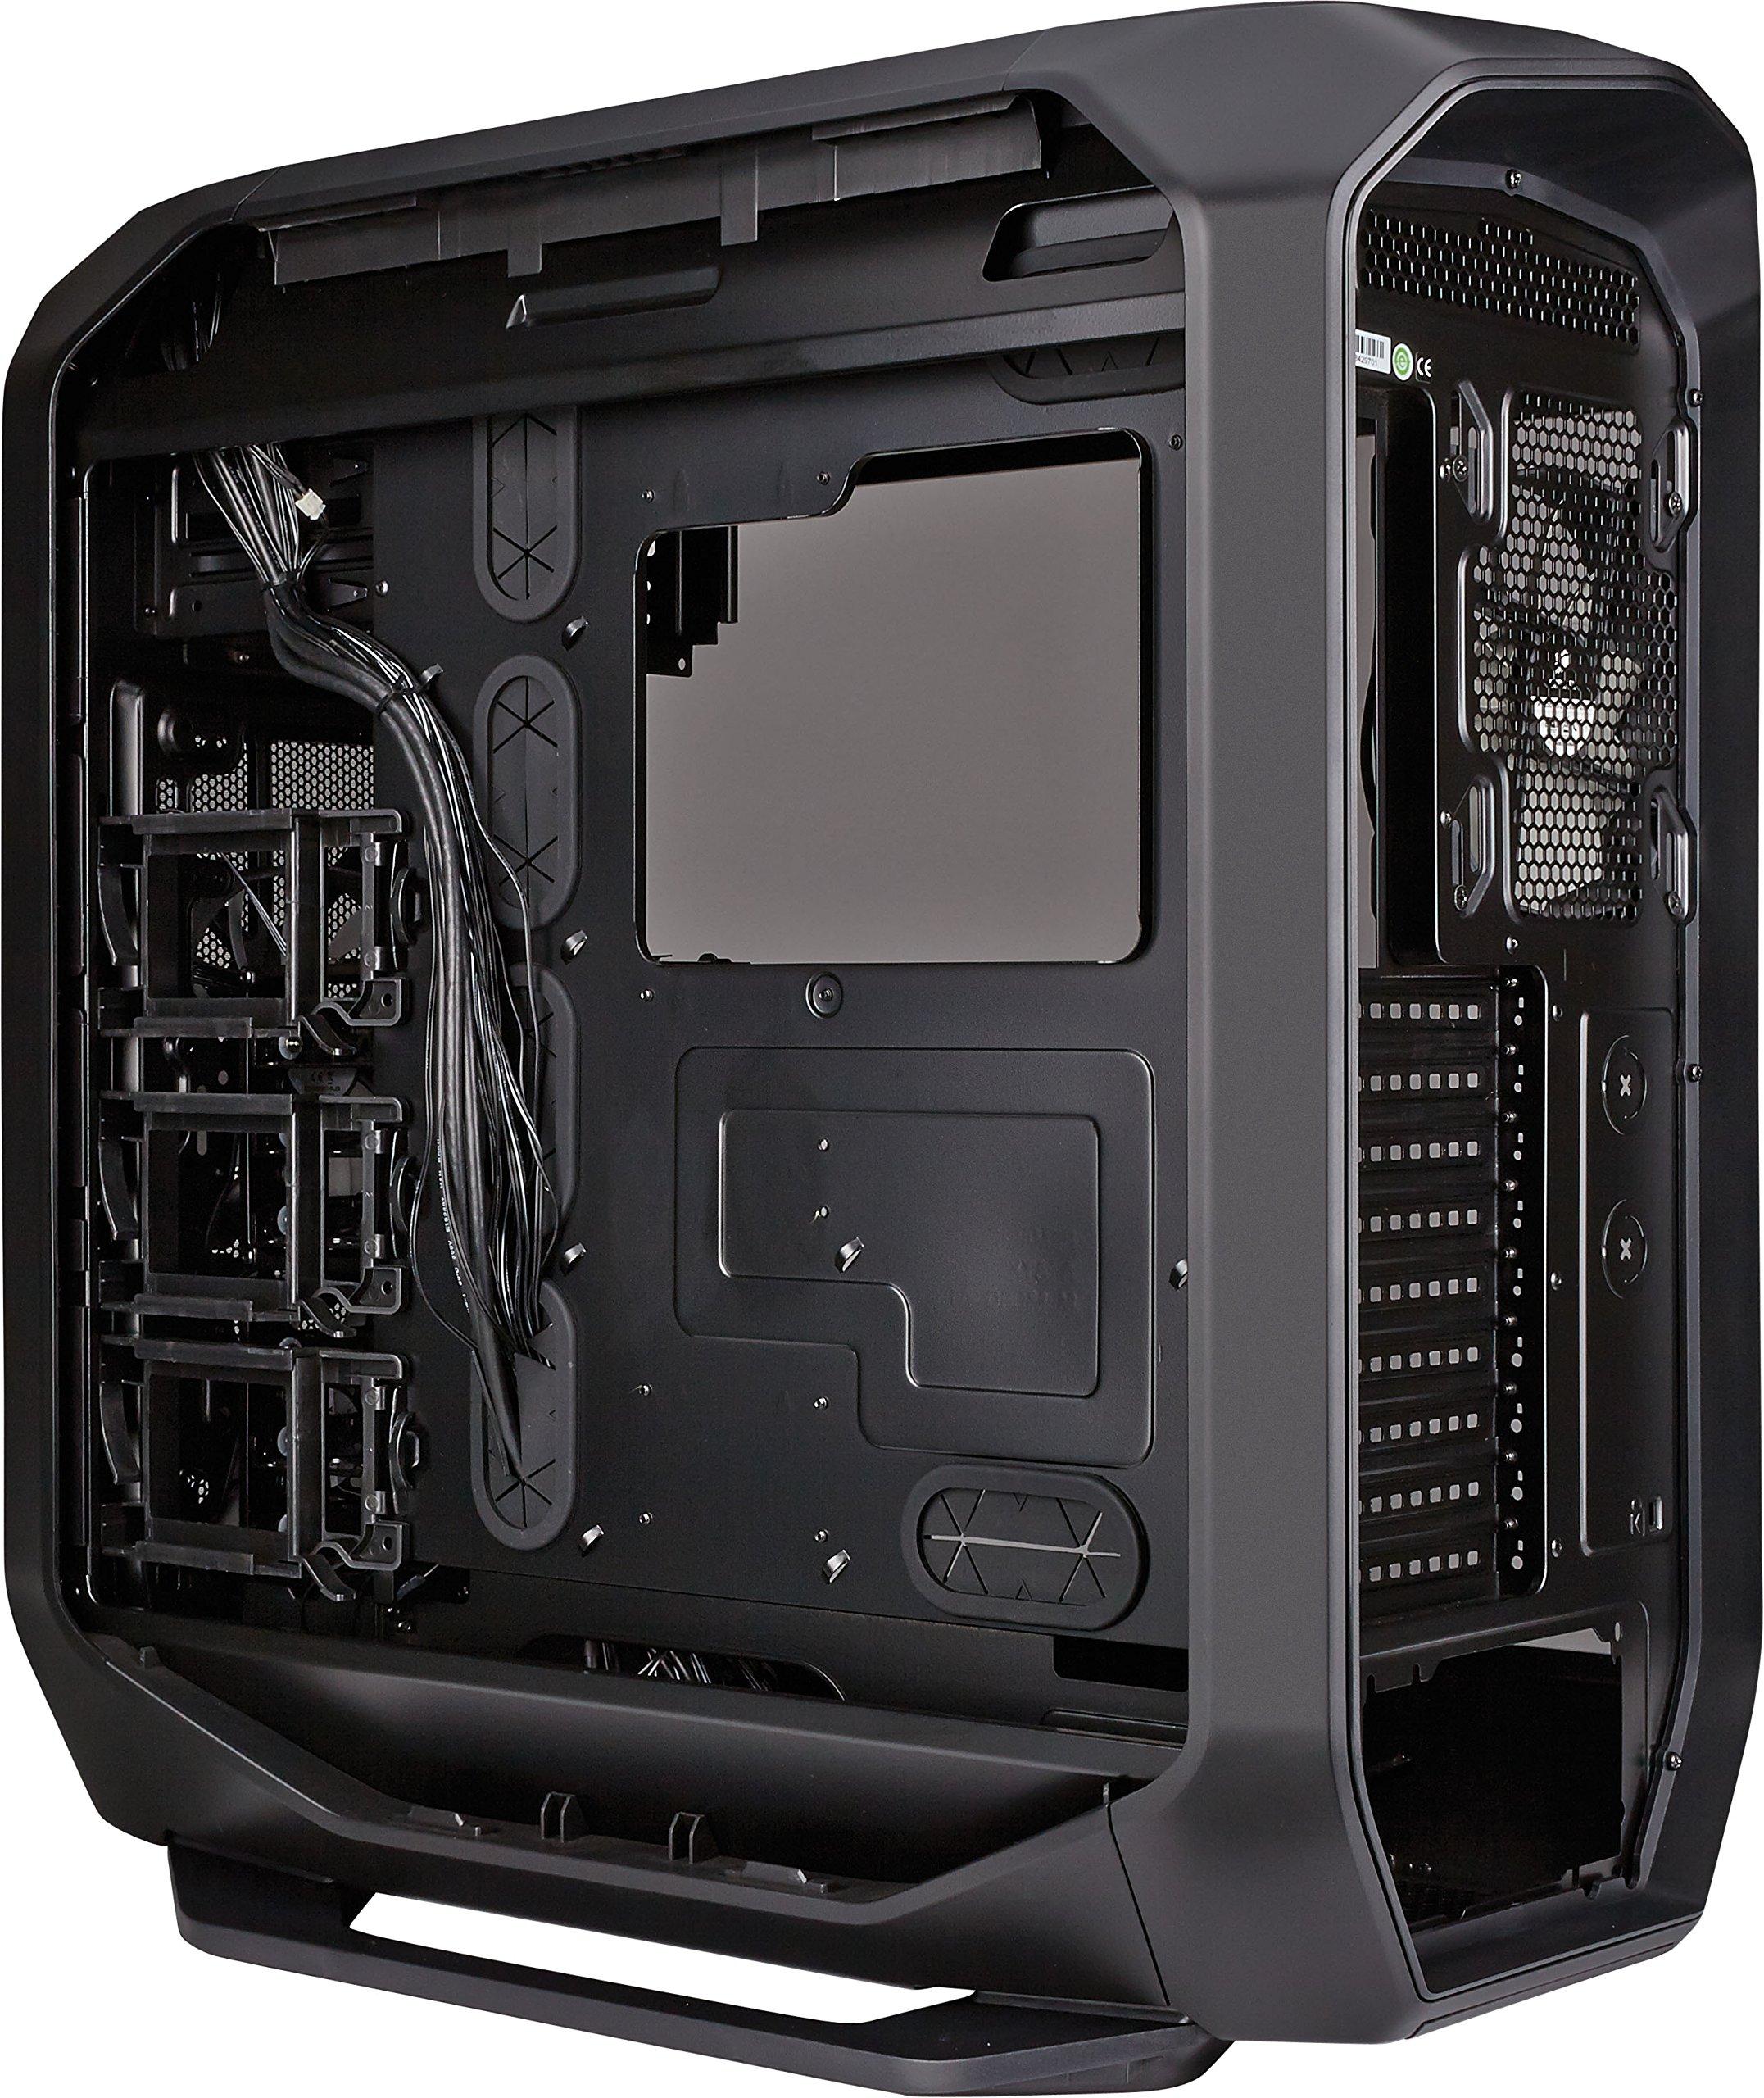 Corsair Graphite Series 780T Full Tower PC Case - Black by Corsair (Image #8)